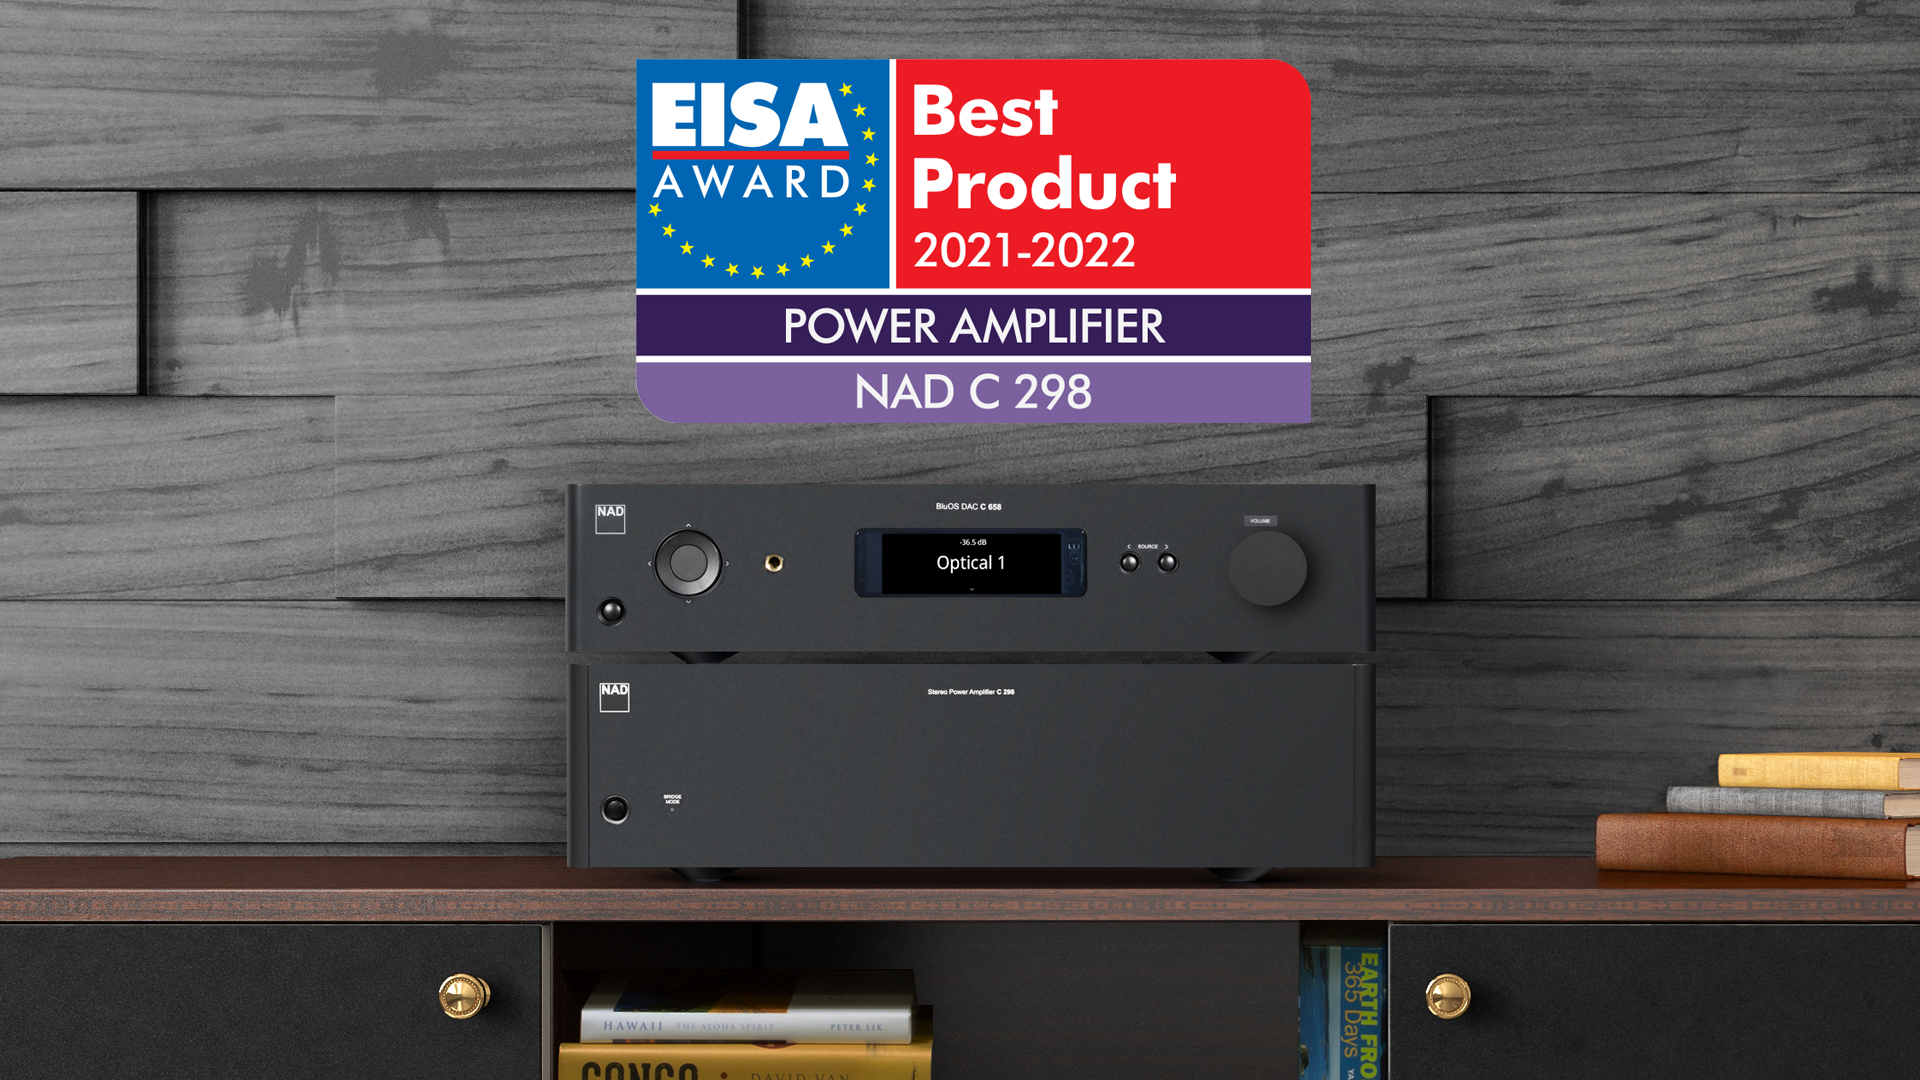 NAD C298 EISA Award winner